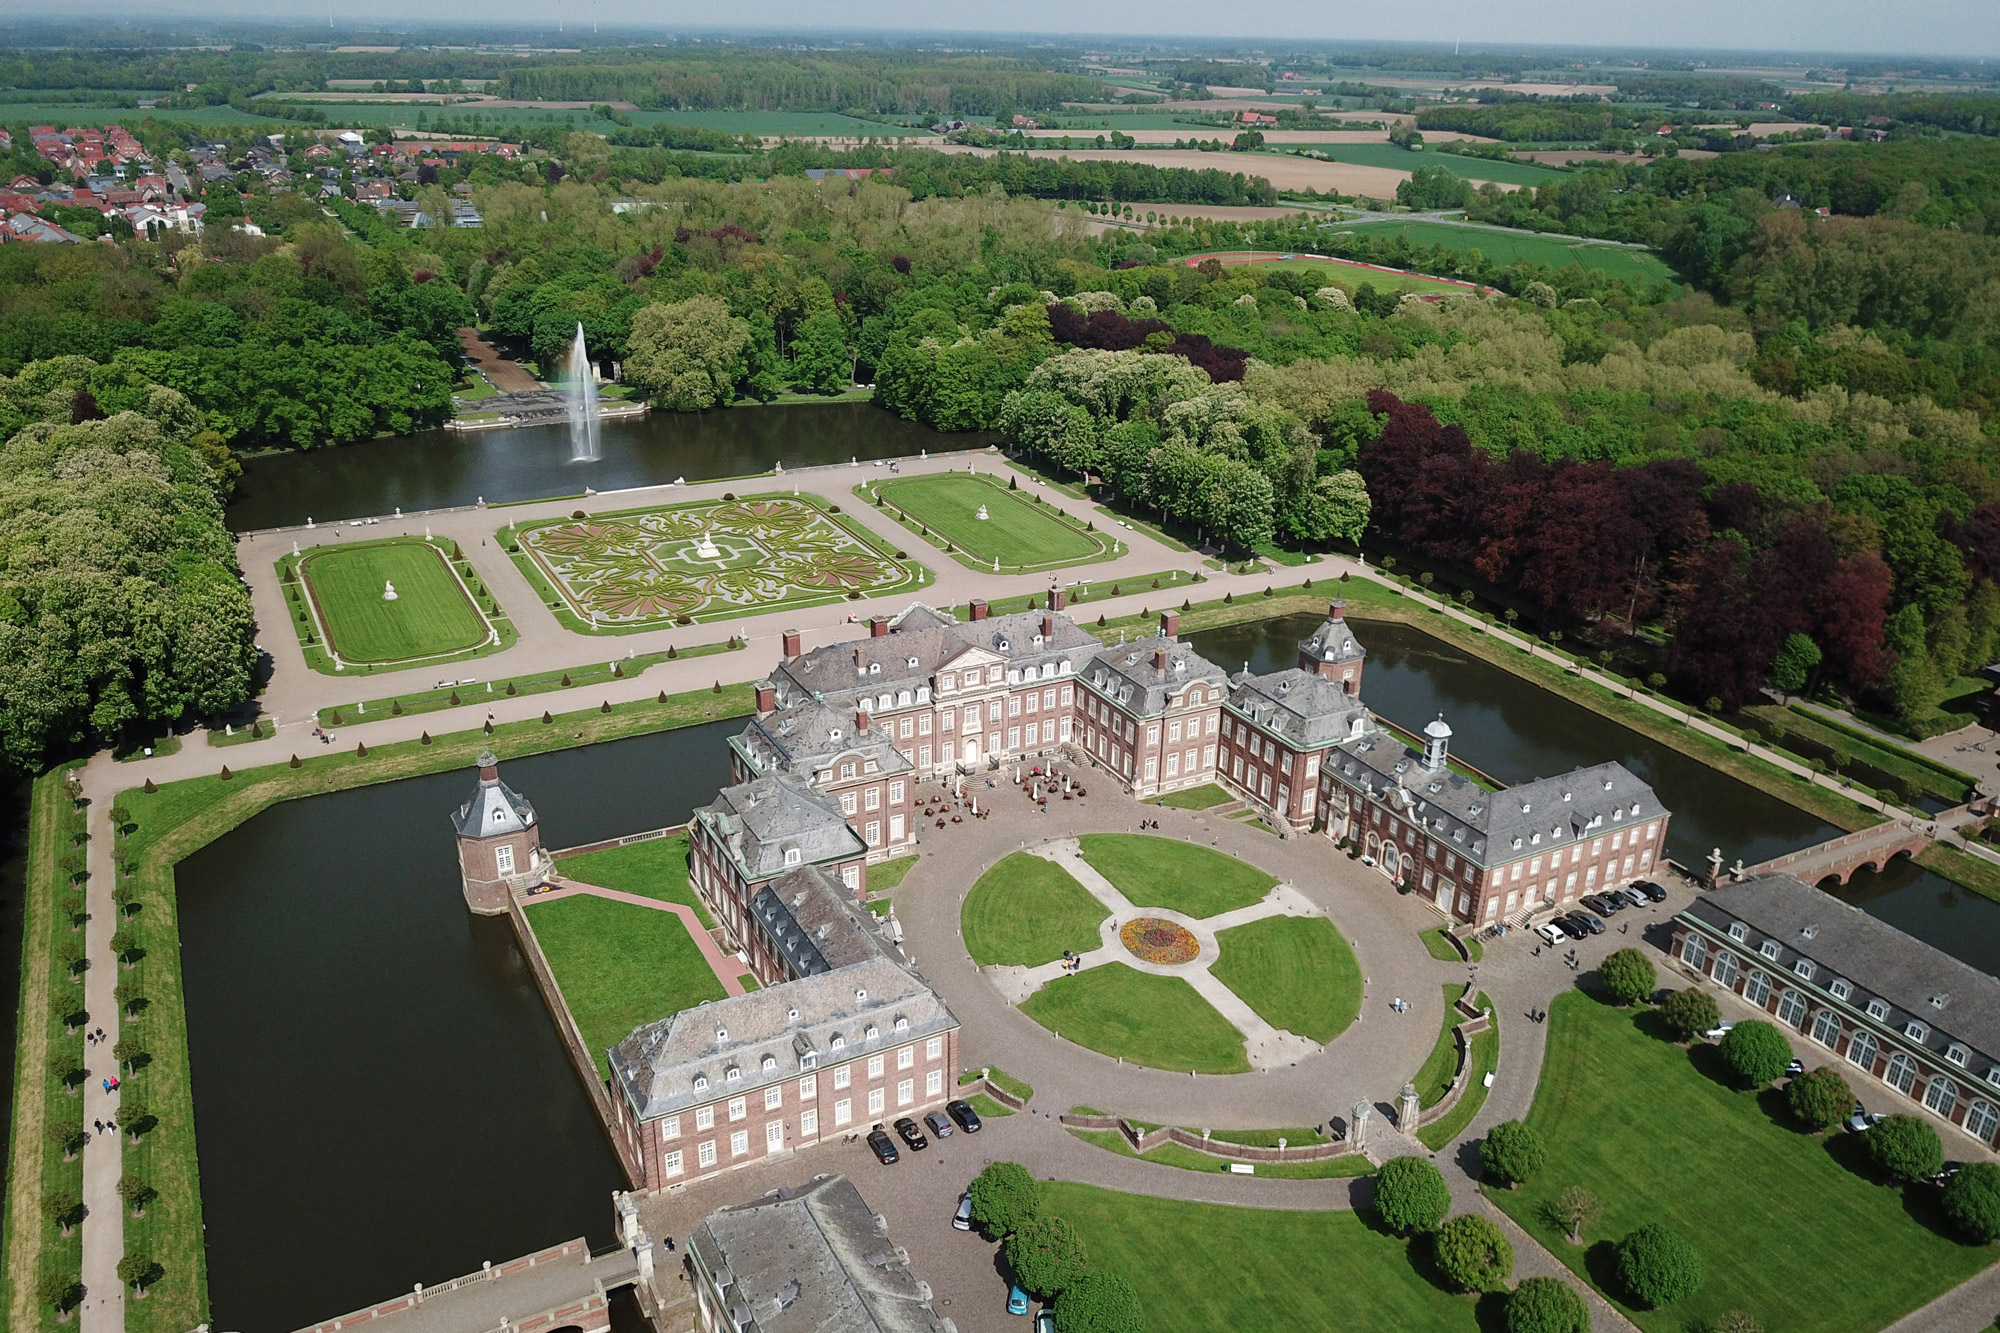 Mooiste reisfoto's 2018 0- Schloss Nordkirchen